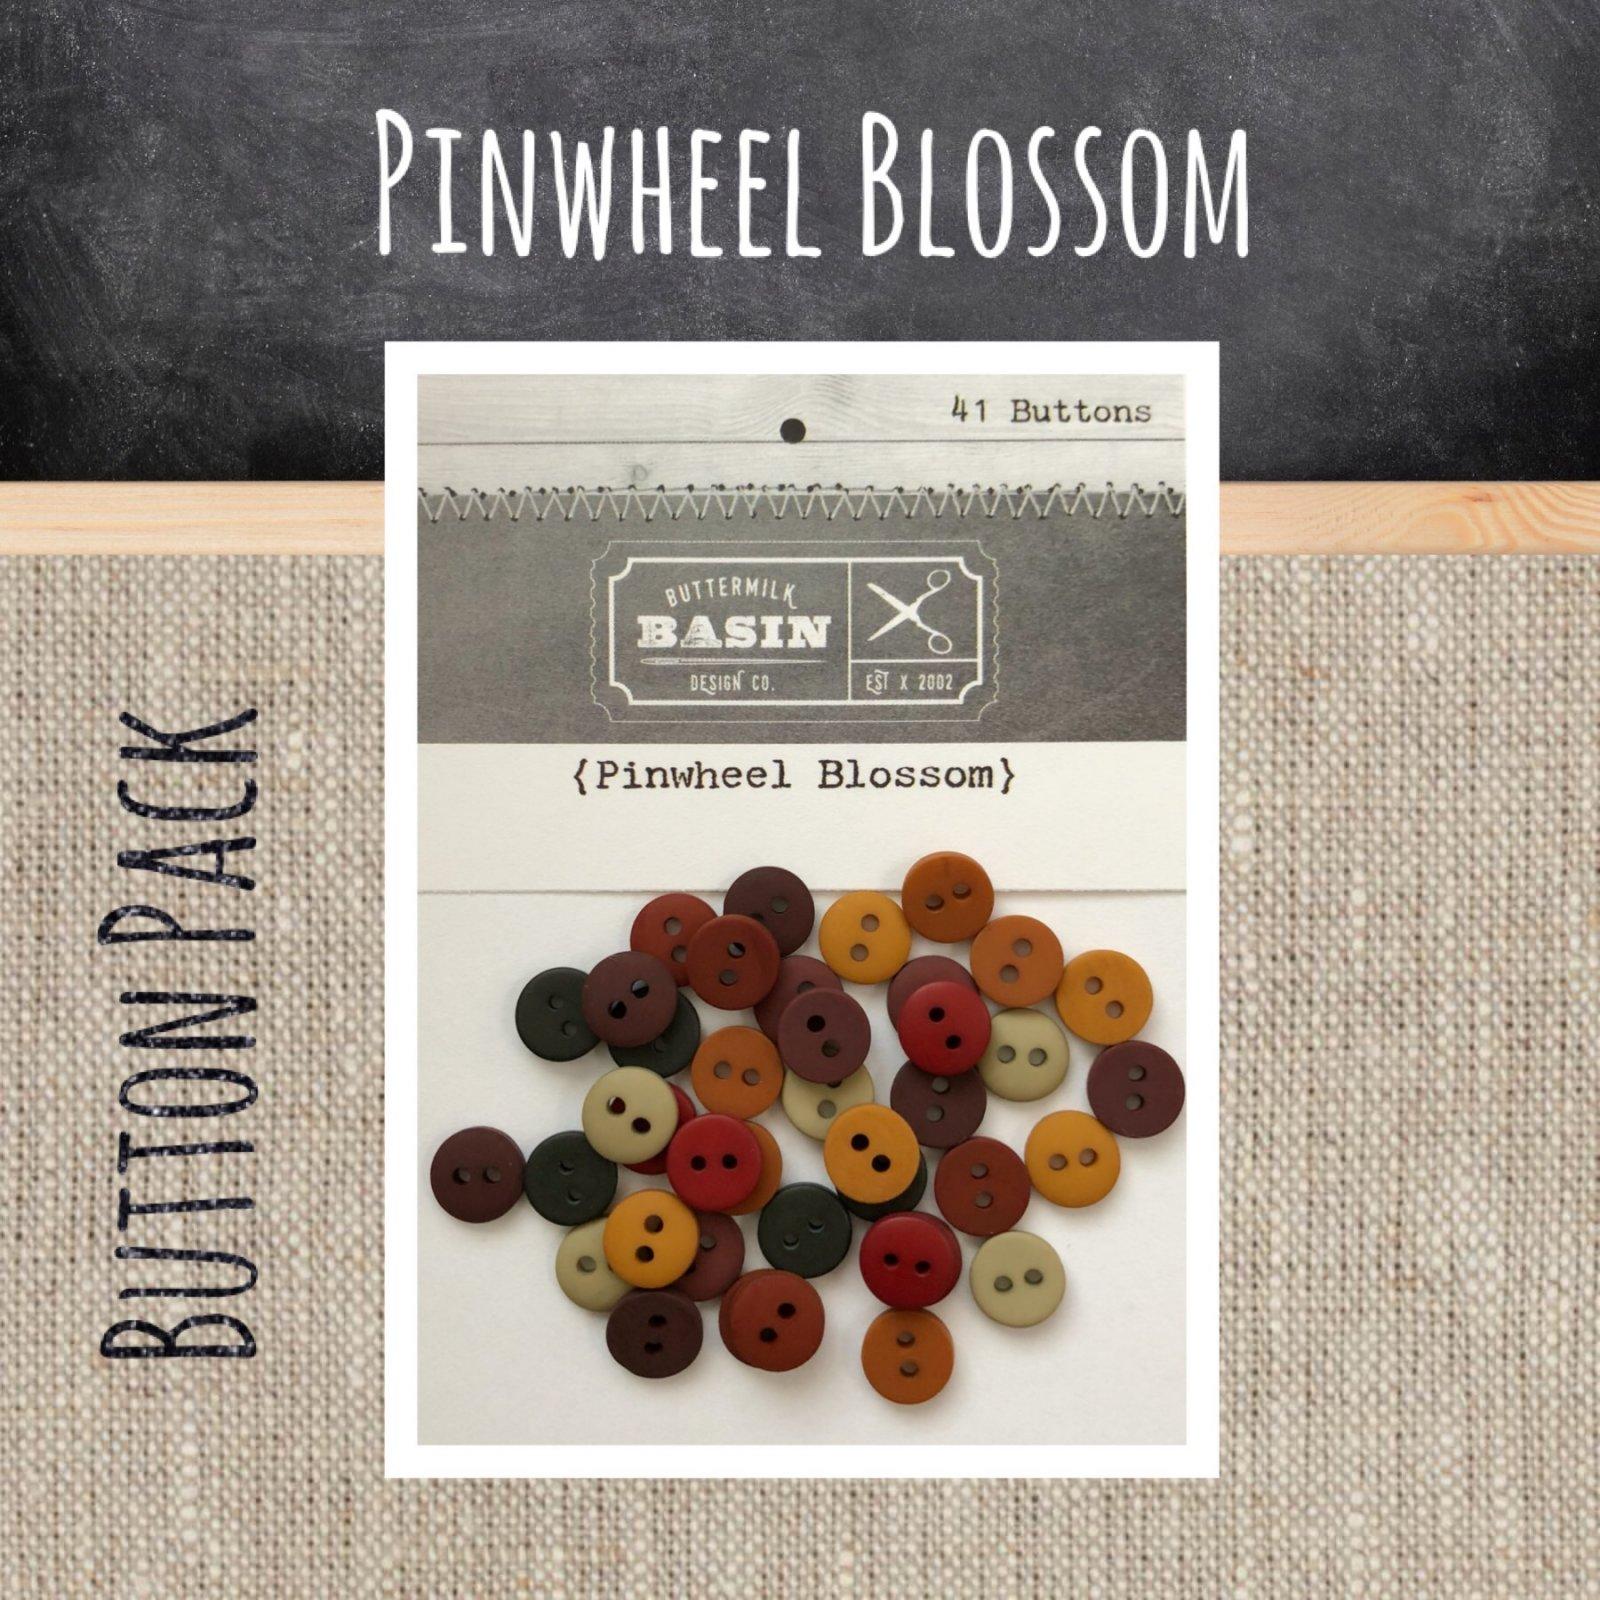 Pinwheel Blossom BUTTON Pack